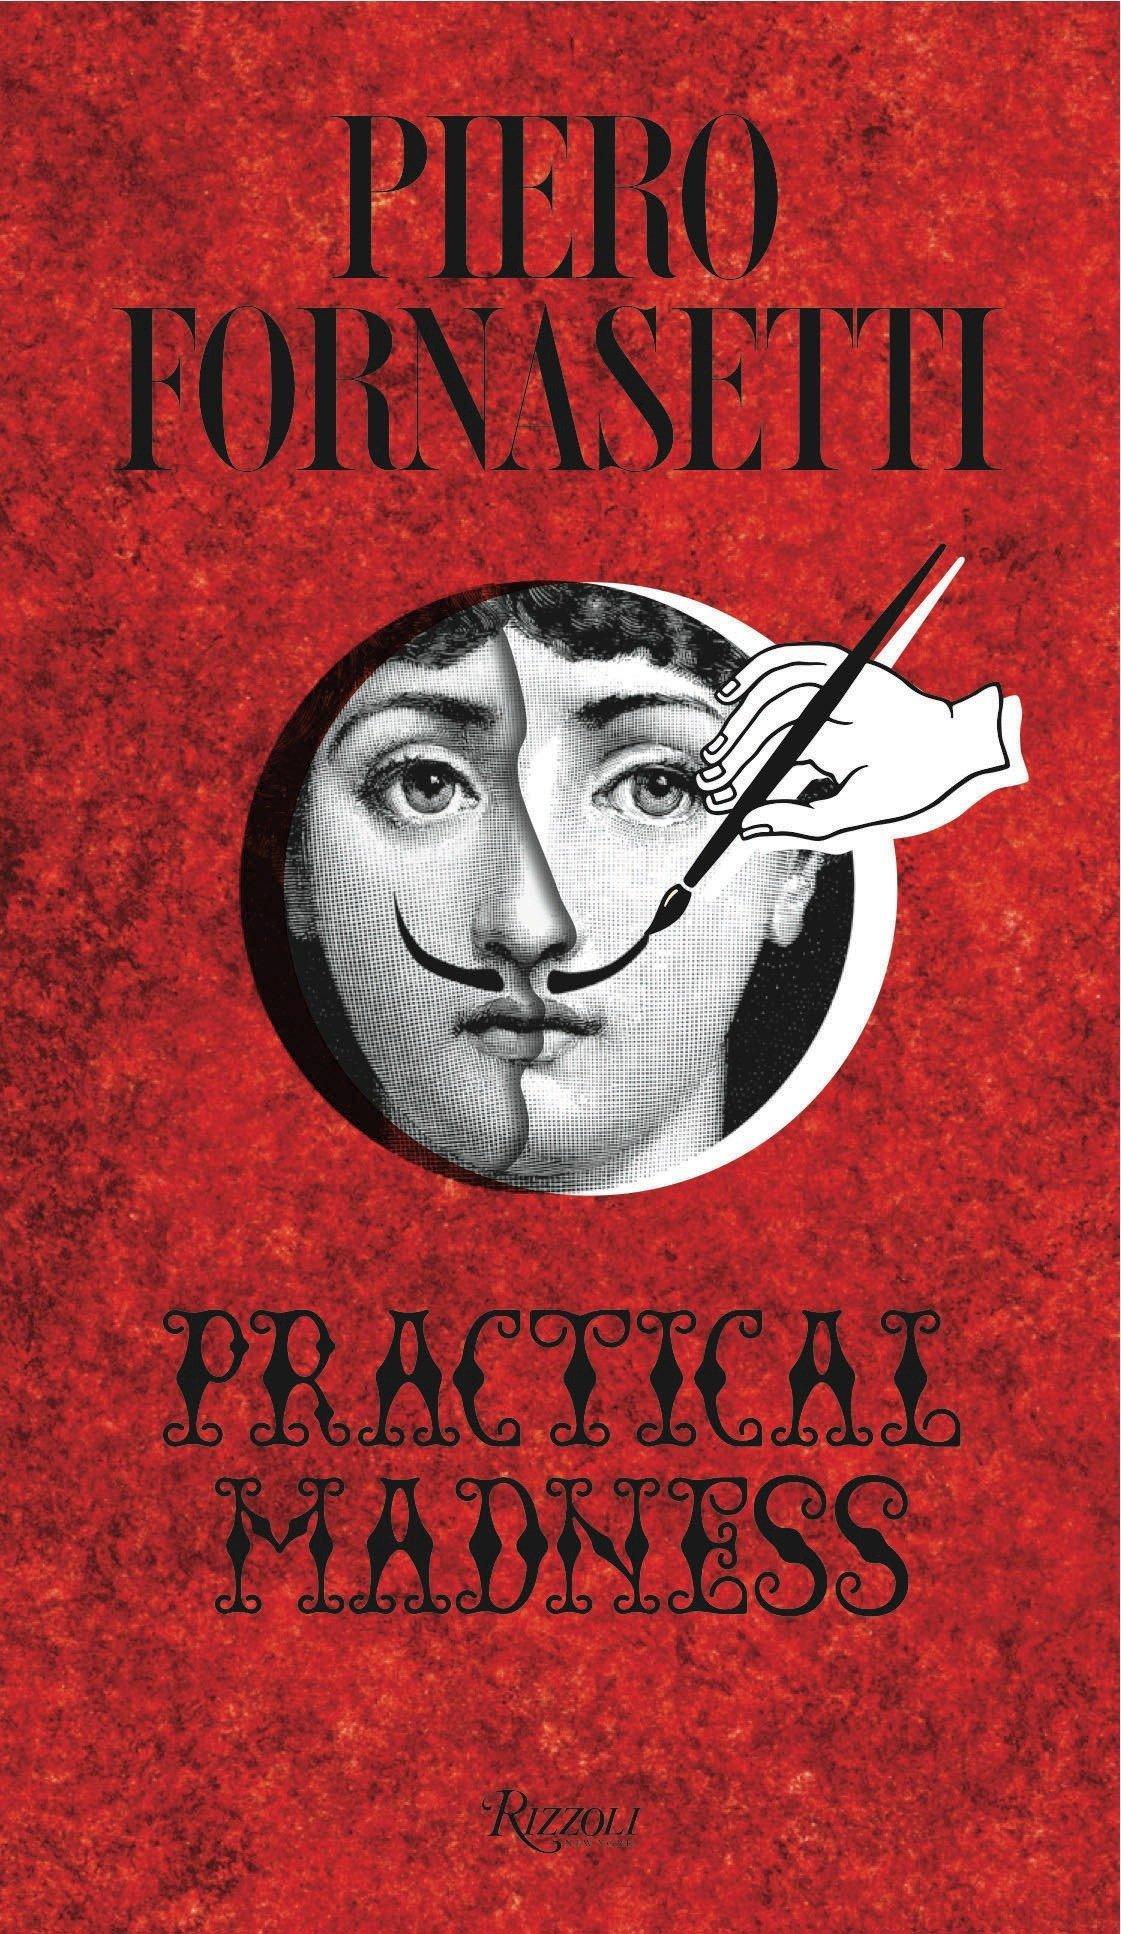 Piero Fornasetti: Practical Madness